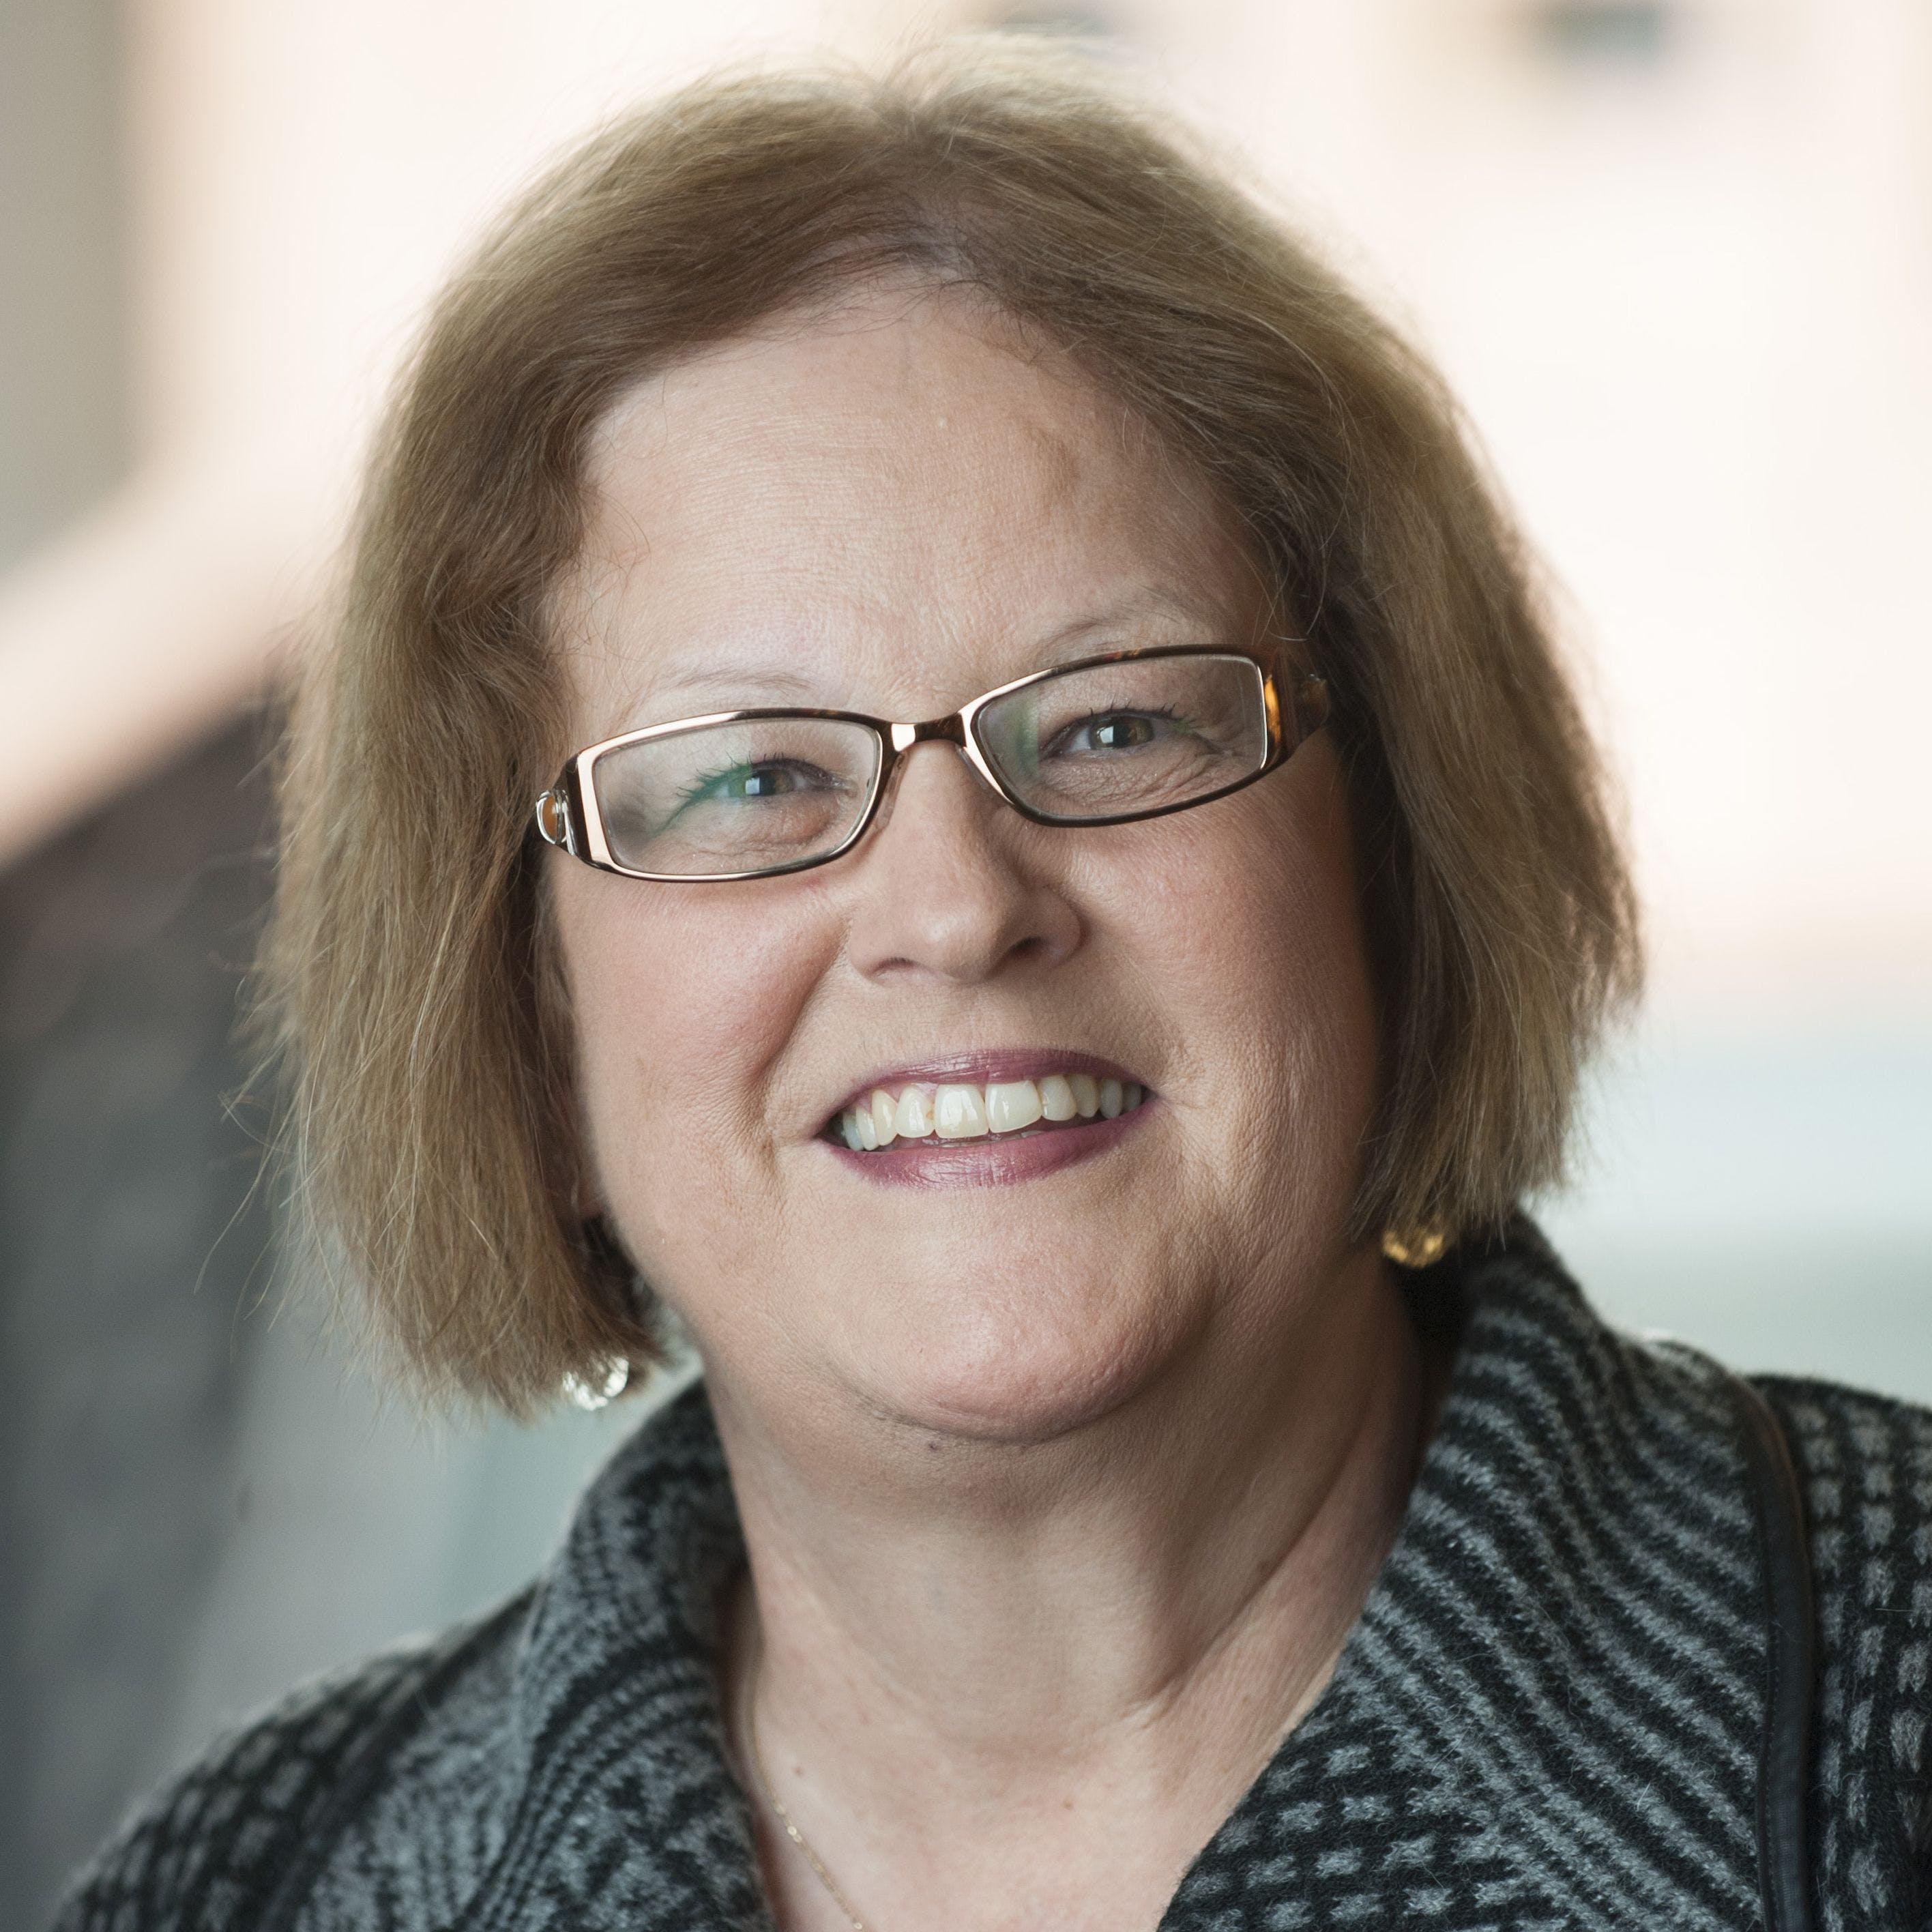 Beth Peterson